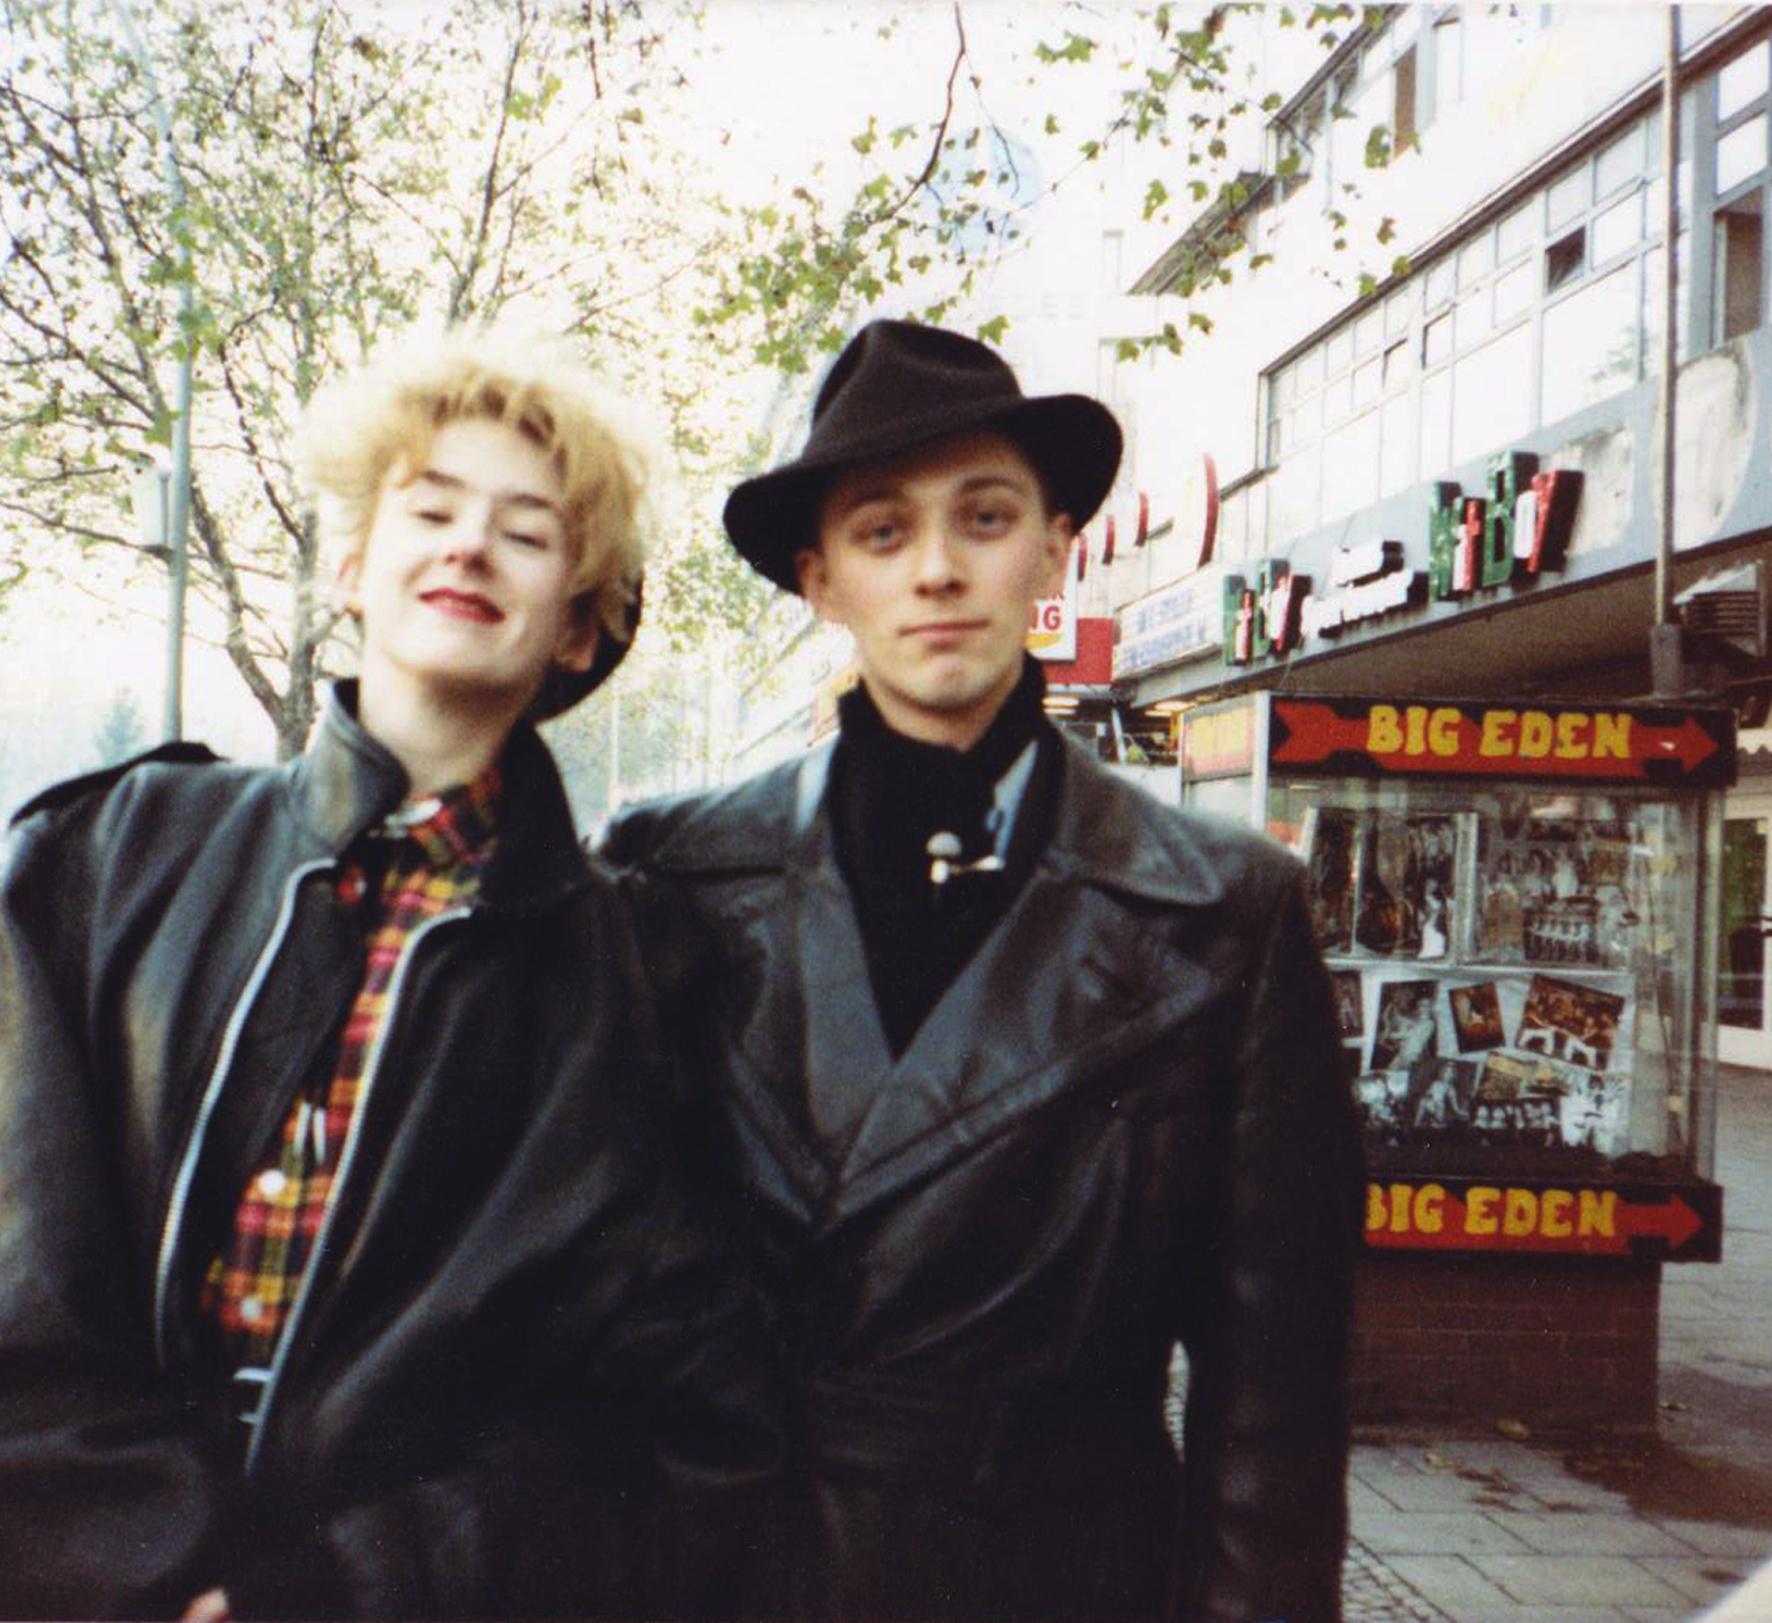 Cicle de cinema alemany actual 2016: B-Movie. Lust & Sound in West-Berlin 1979-1989